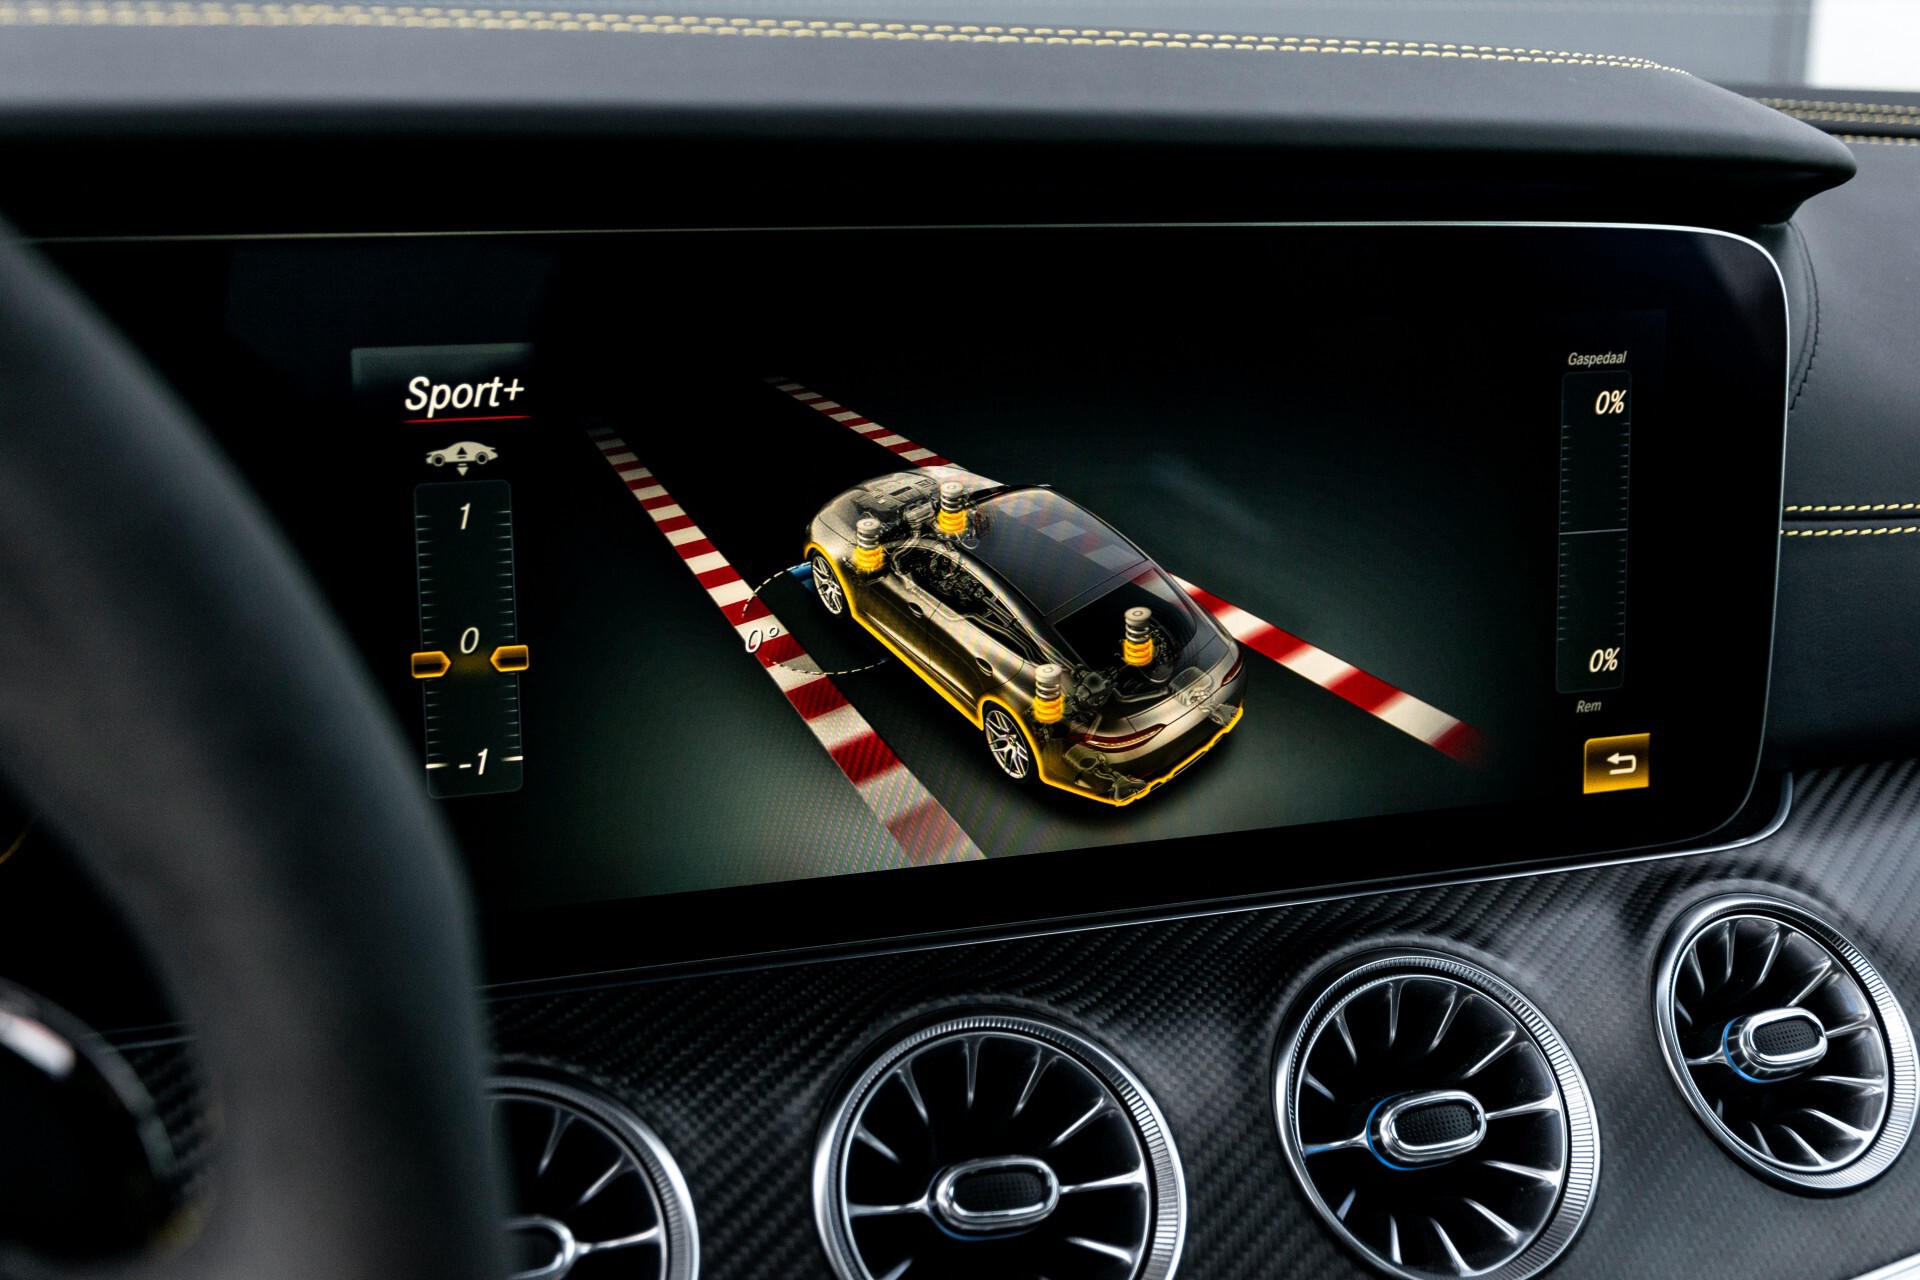 Mercedes-Benz AMG GT 4-Door Coupe 63 S 4MATIC+ Edition 1 Keramisch/Carbon/First Class/Dynamic Plus/Burmester High End 3D Aut9 Foto 37